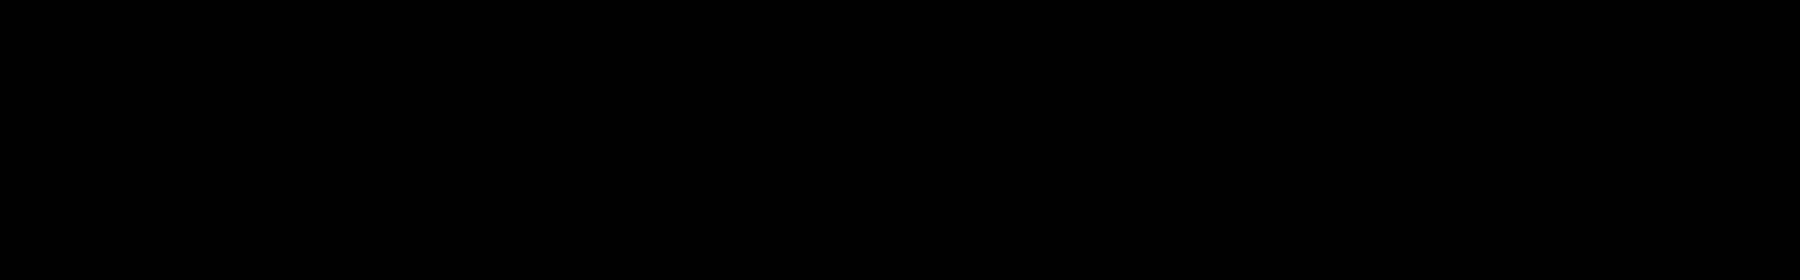 Black Techno 3 audio waveform